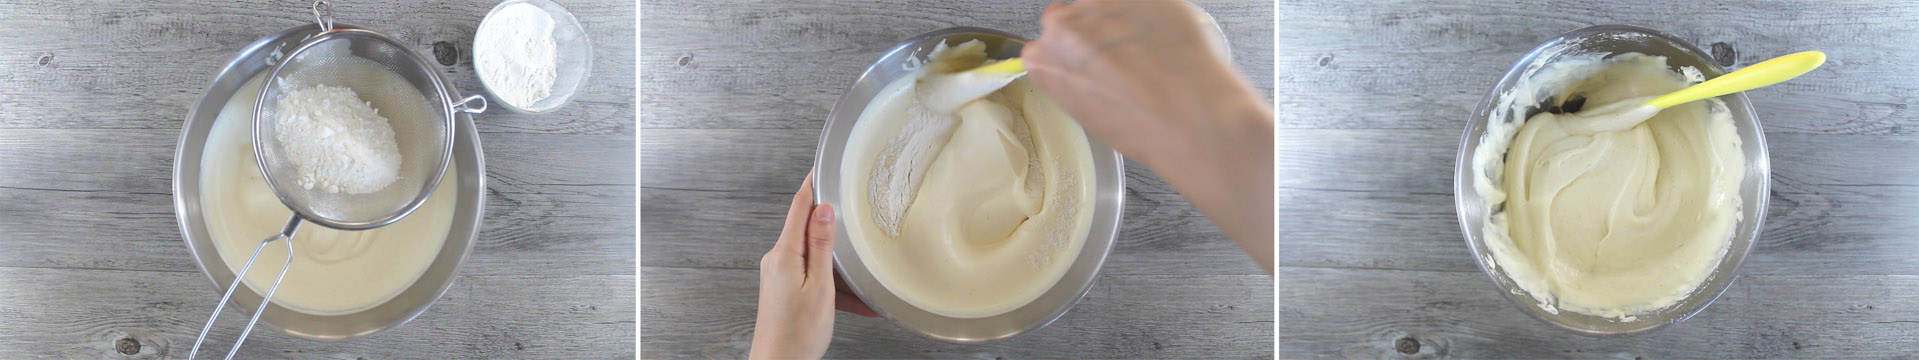 pan di spagna arancia con farina